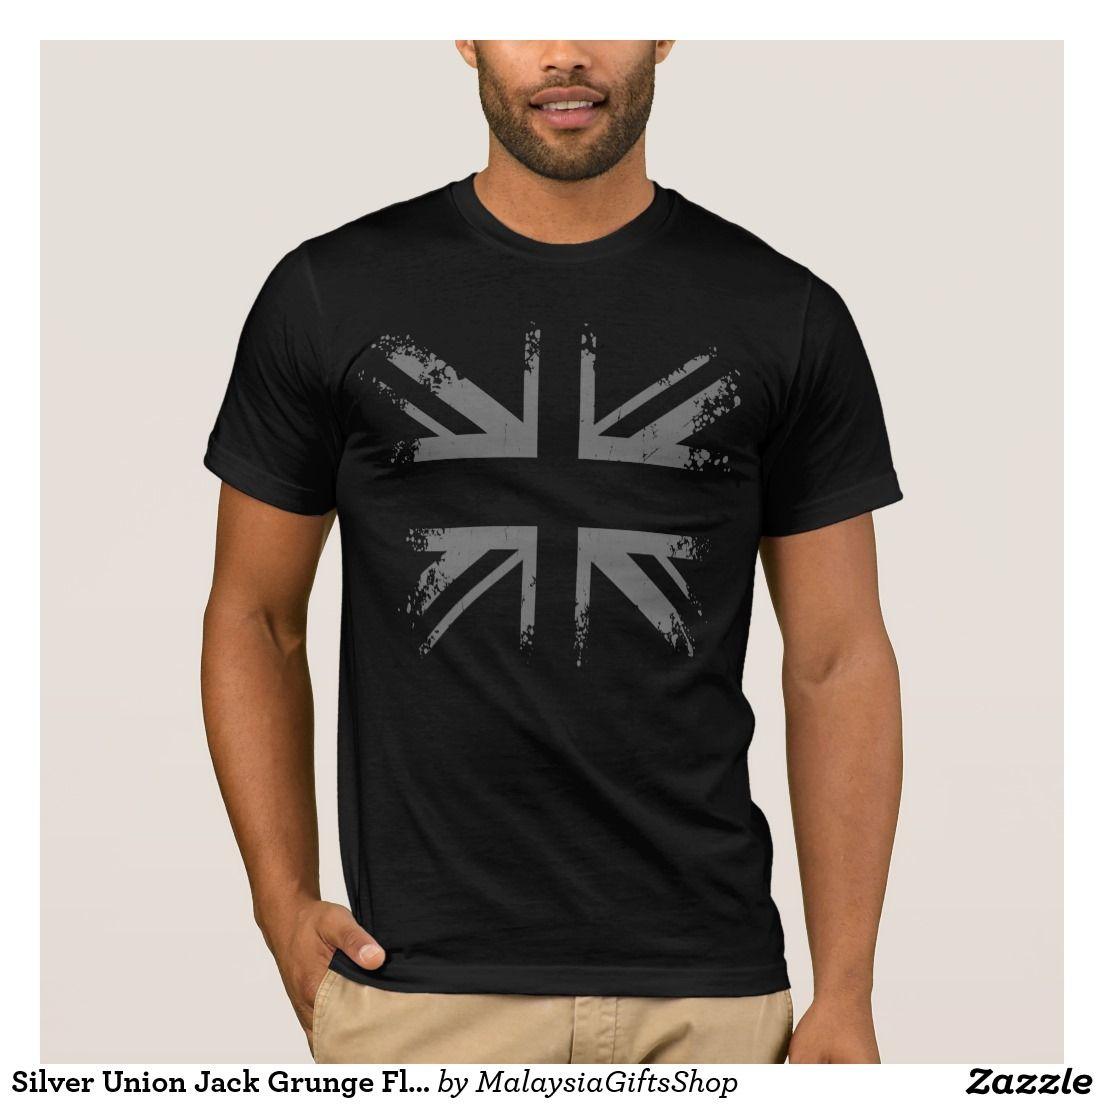 Black t shirt grunge - Silver Union Jack Grunge Flag T Shirt